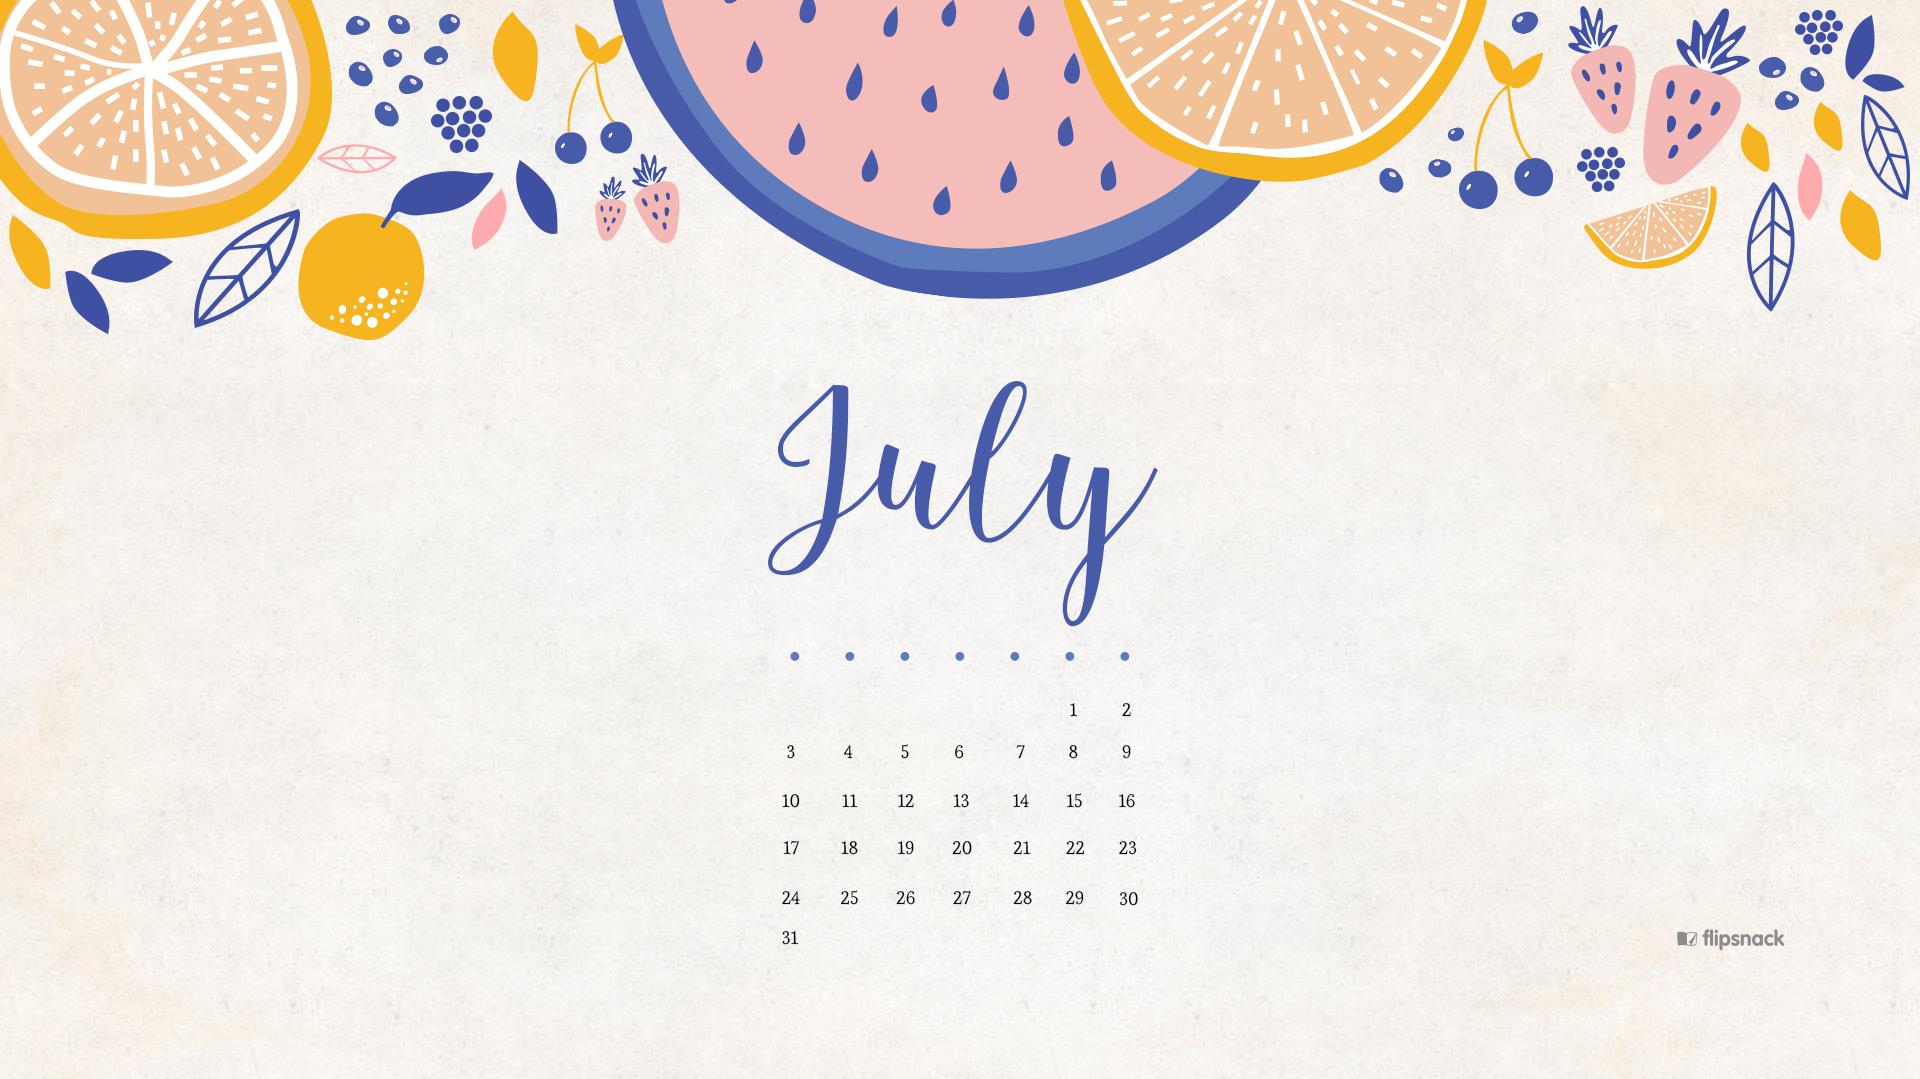 Desktop Wallpapers Calendar June 2015 1JUWWX1   Picseriocom 1920x1079